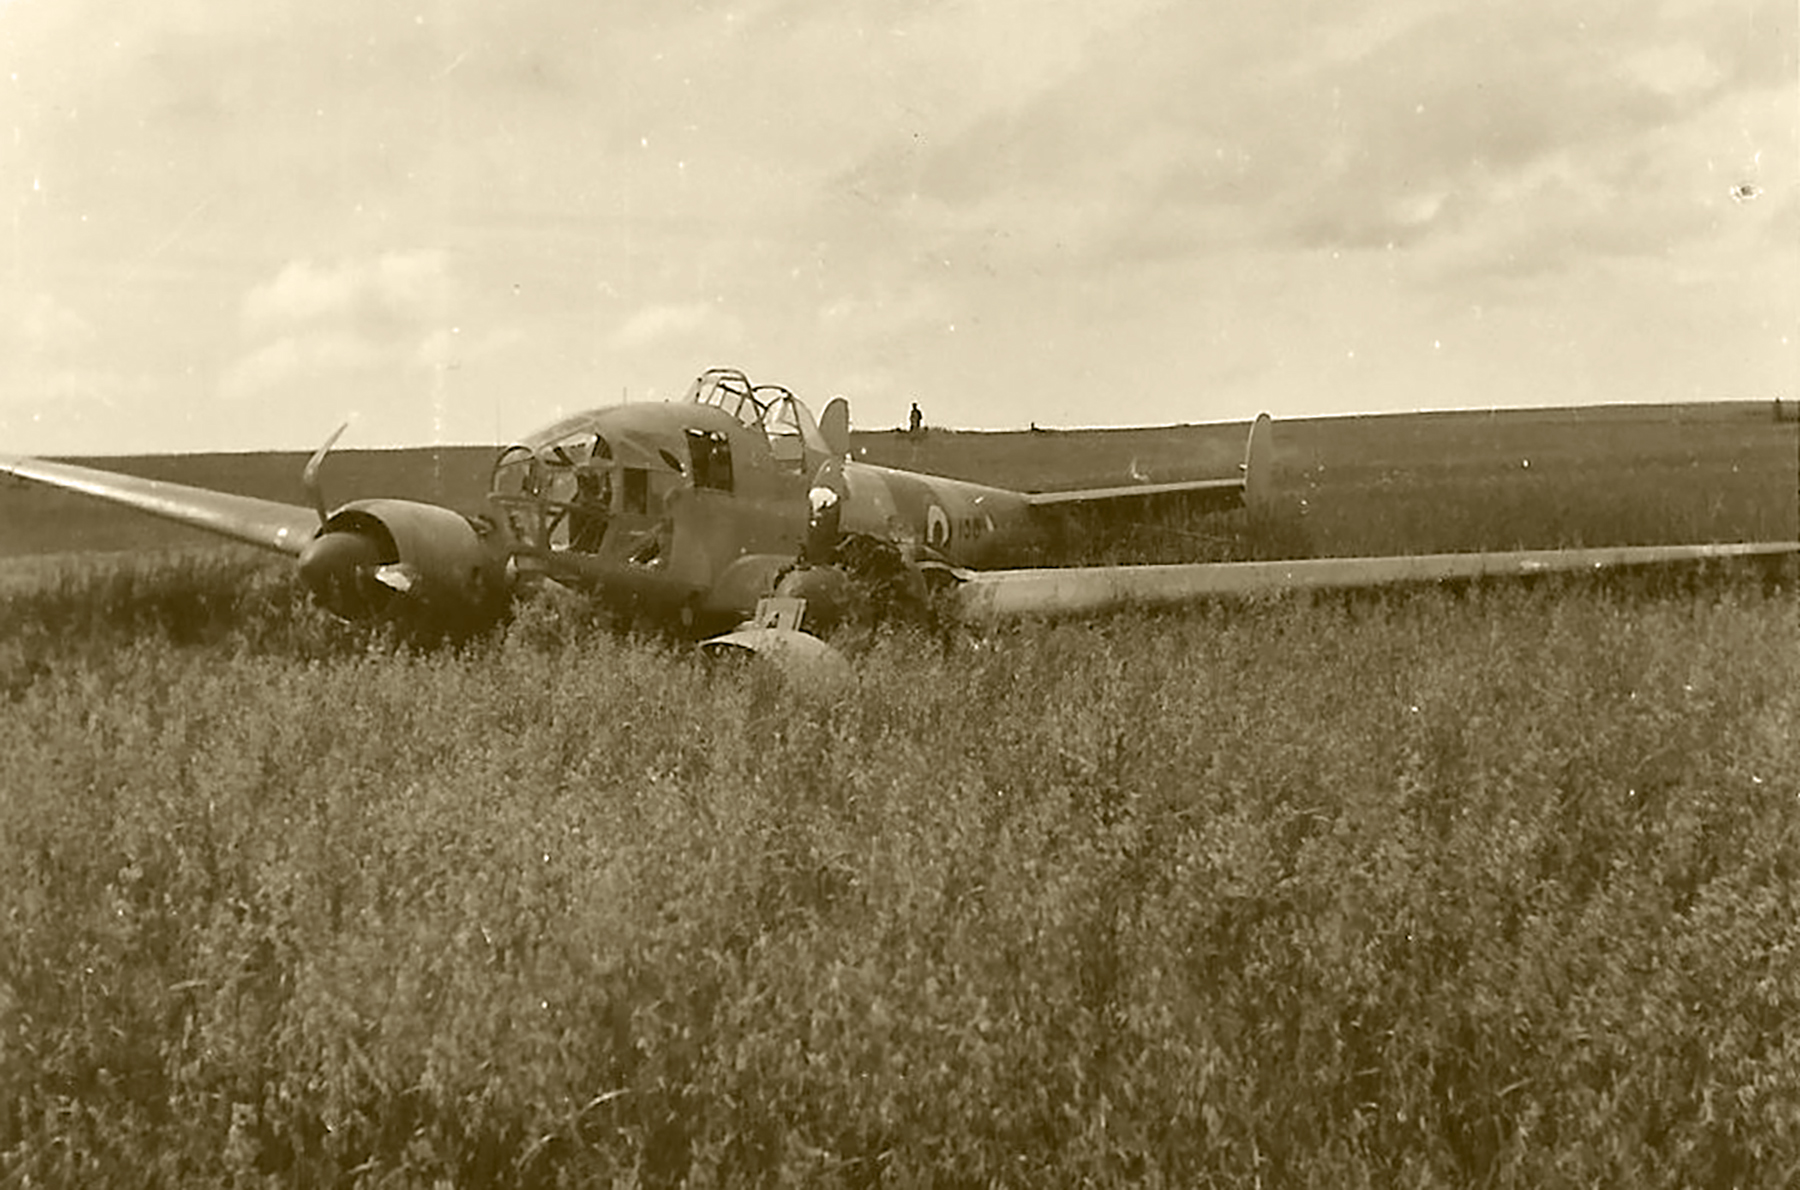 French Airforce Potez 63.11 force landed at Saint Inglevert France 1940 ebay 02